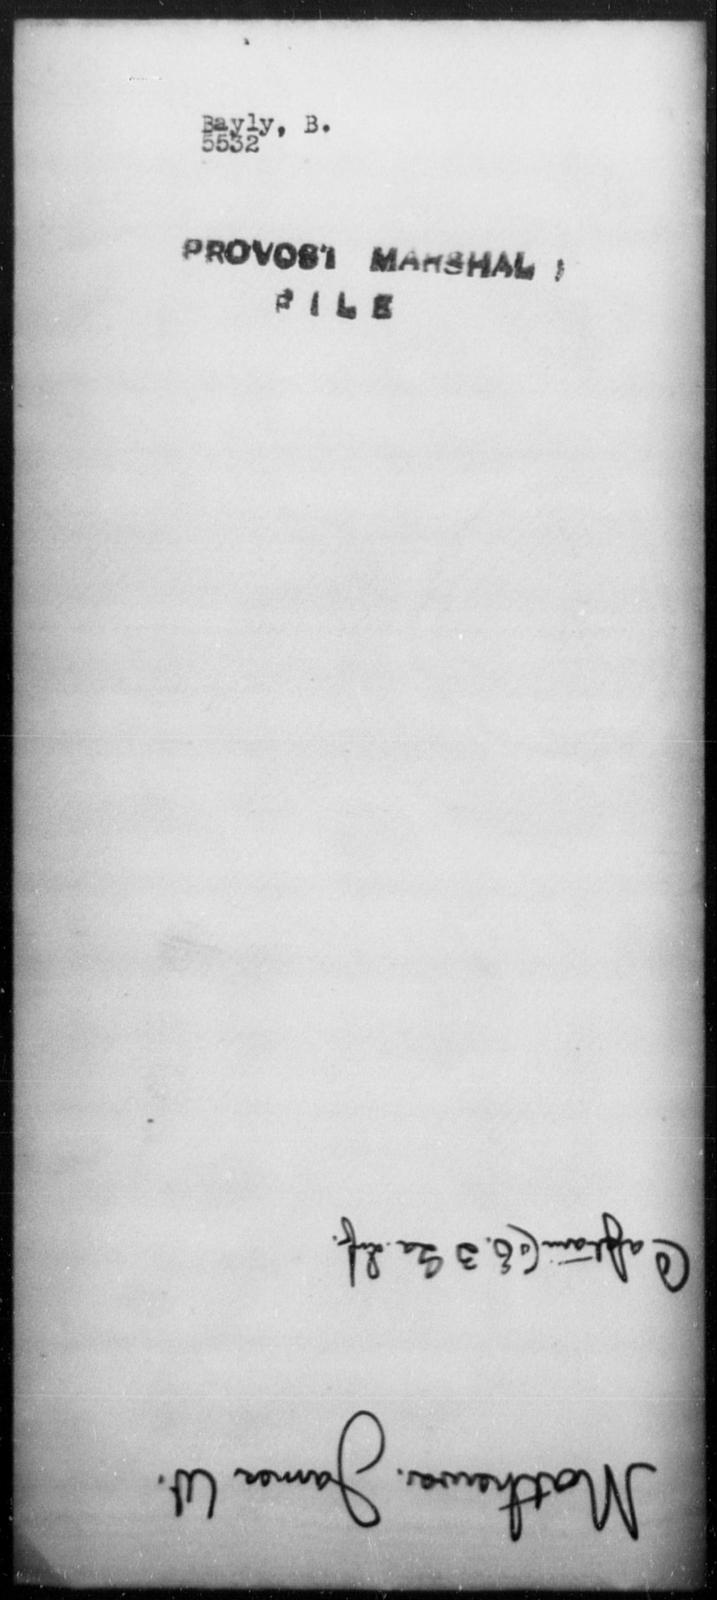 Bayly, B - State: [Blank] - Year: [Blank]